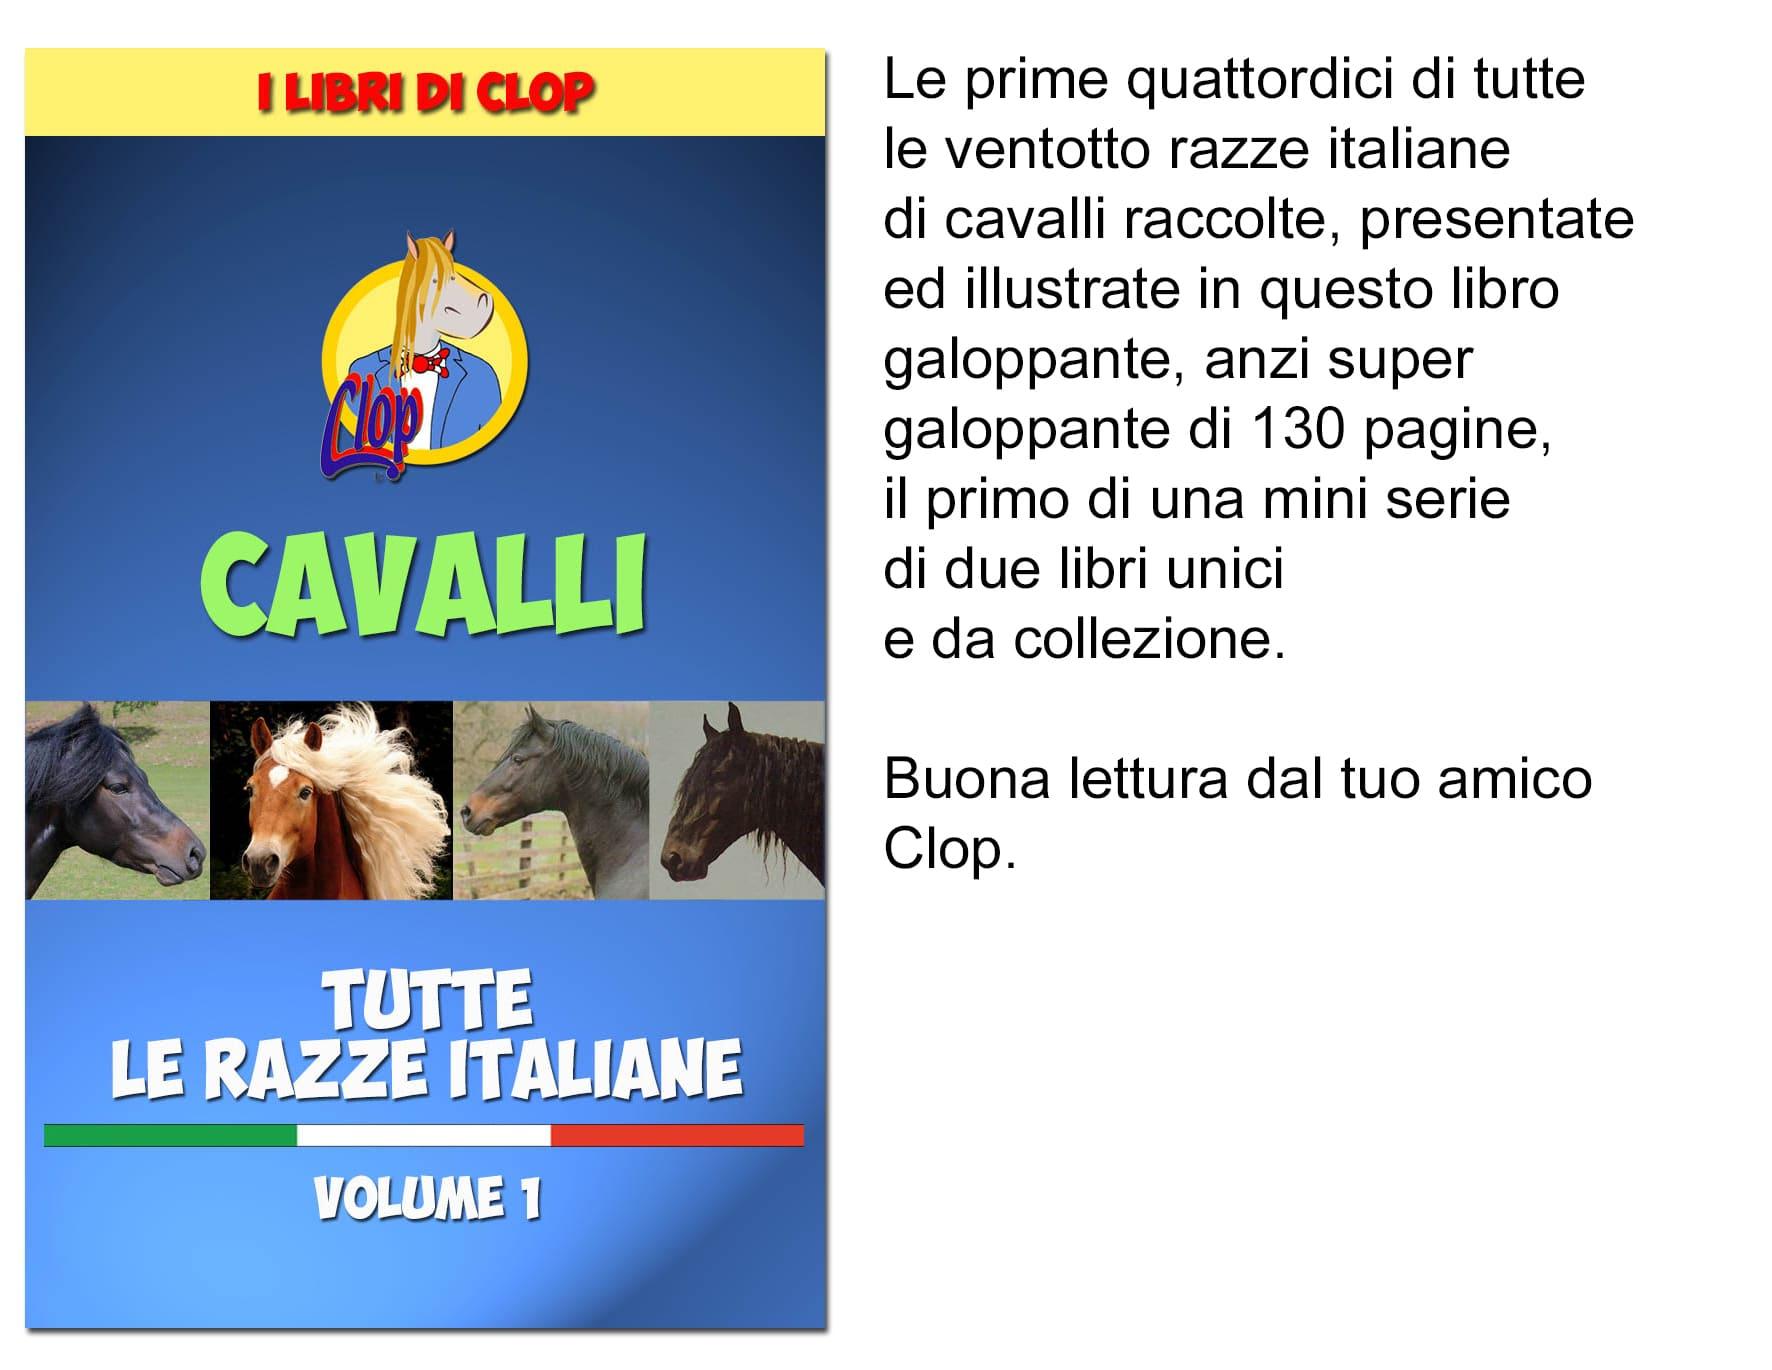 Razze_Italiane